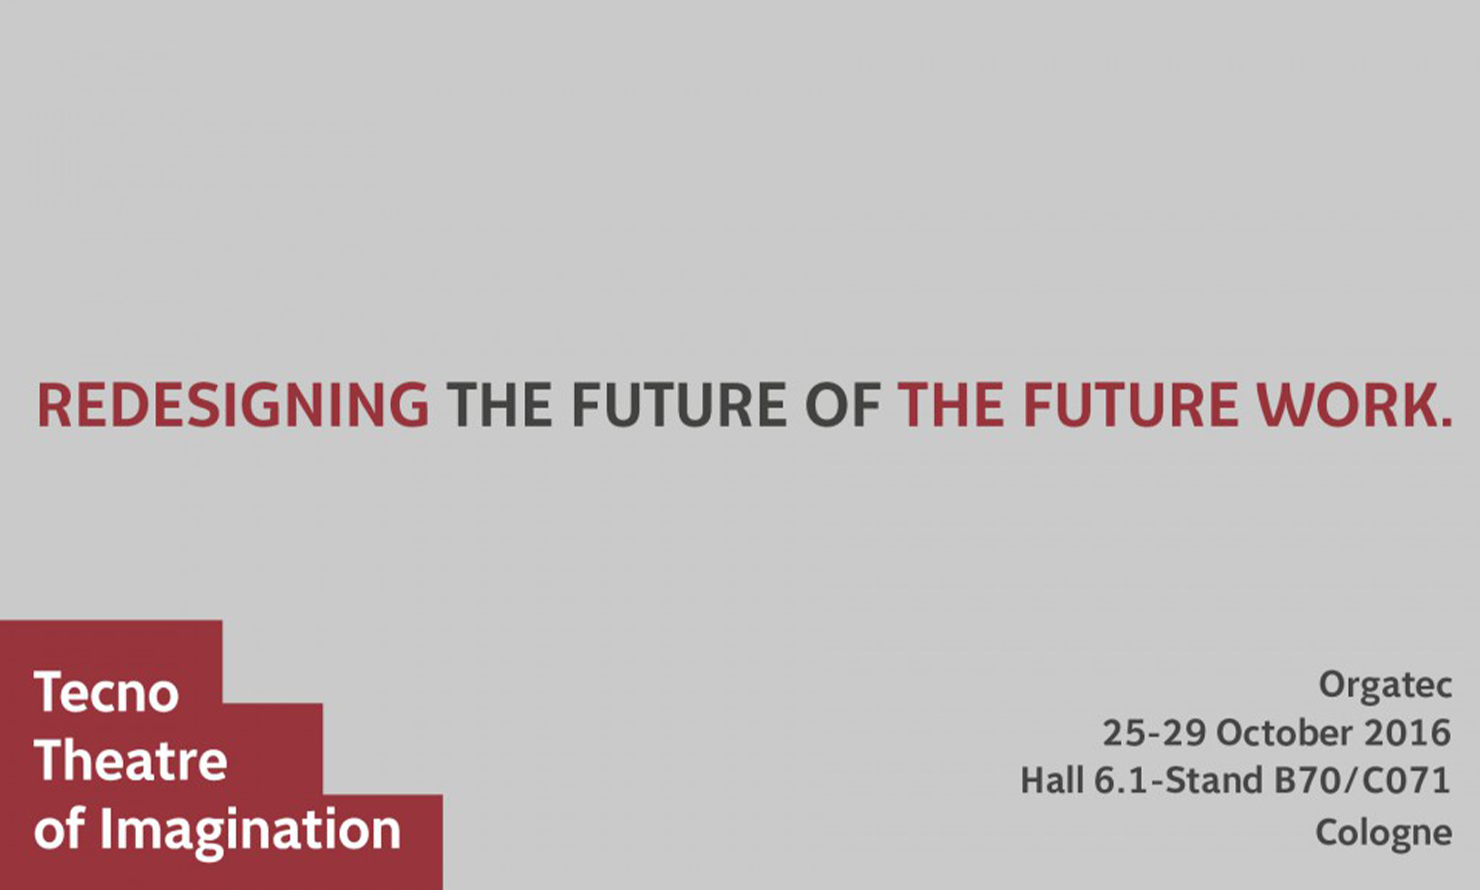 https://www.kubelibre.com/uploads/Slider-work-tutti-clienti/tecno-redesigning-the-future-of-the-future-of-work-6.jpg